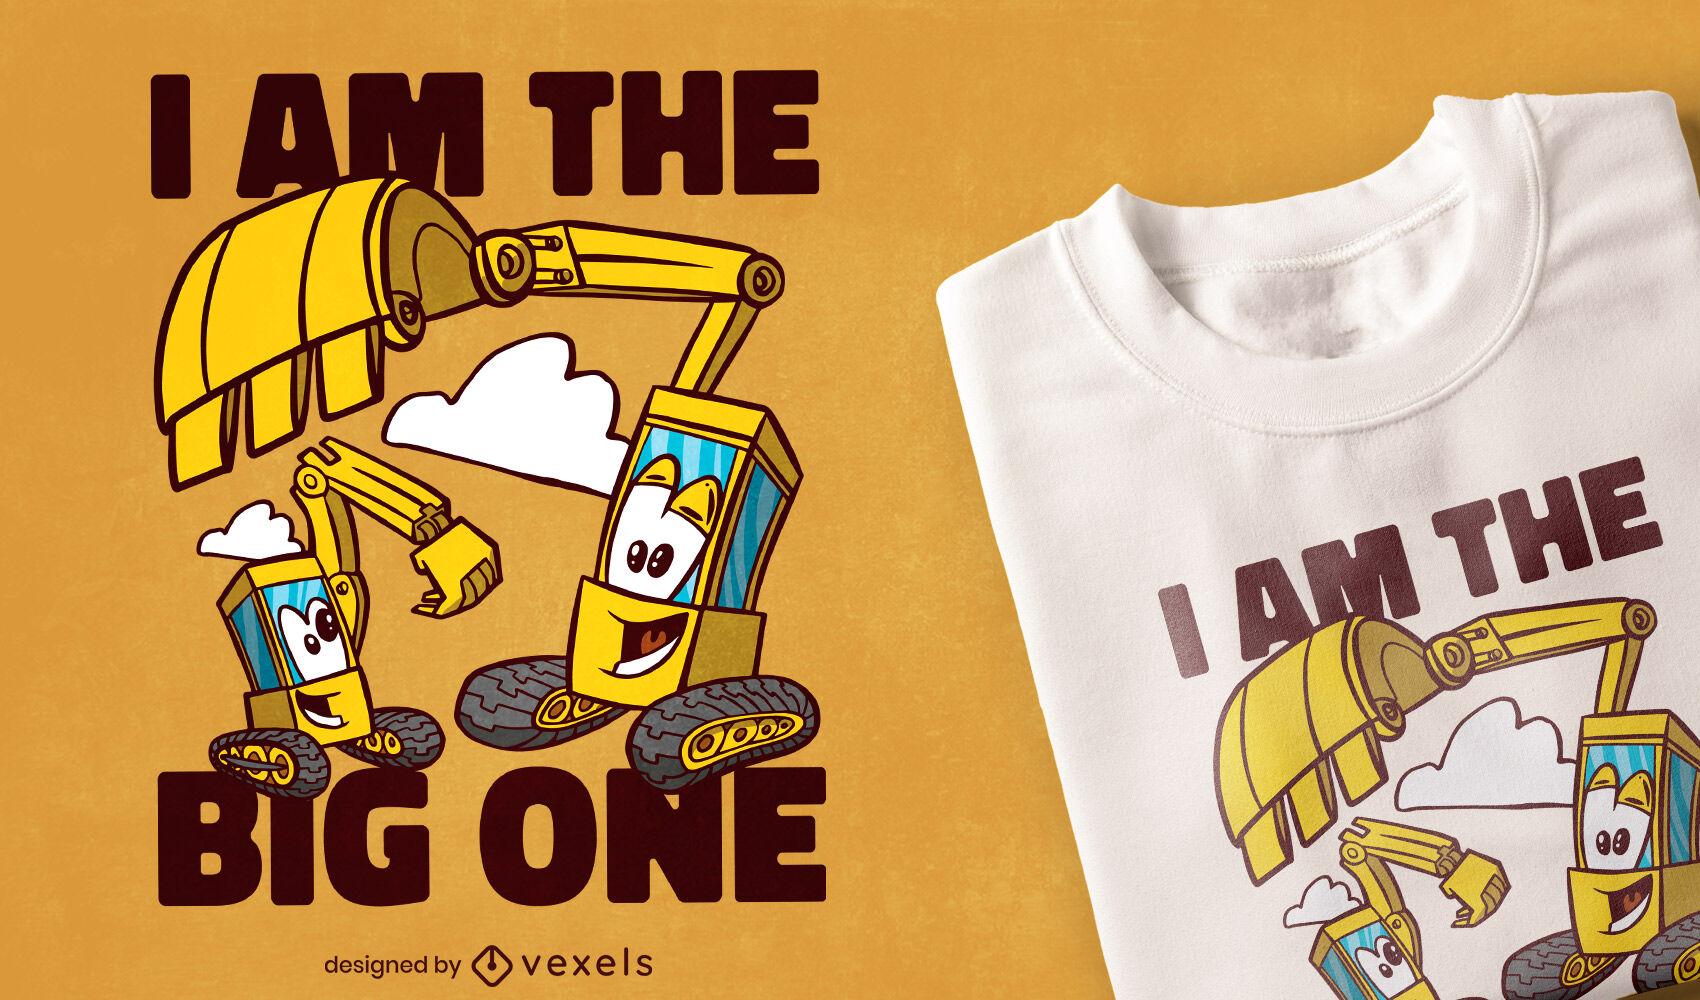 Big brother excavator t-shirt design